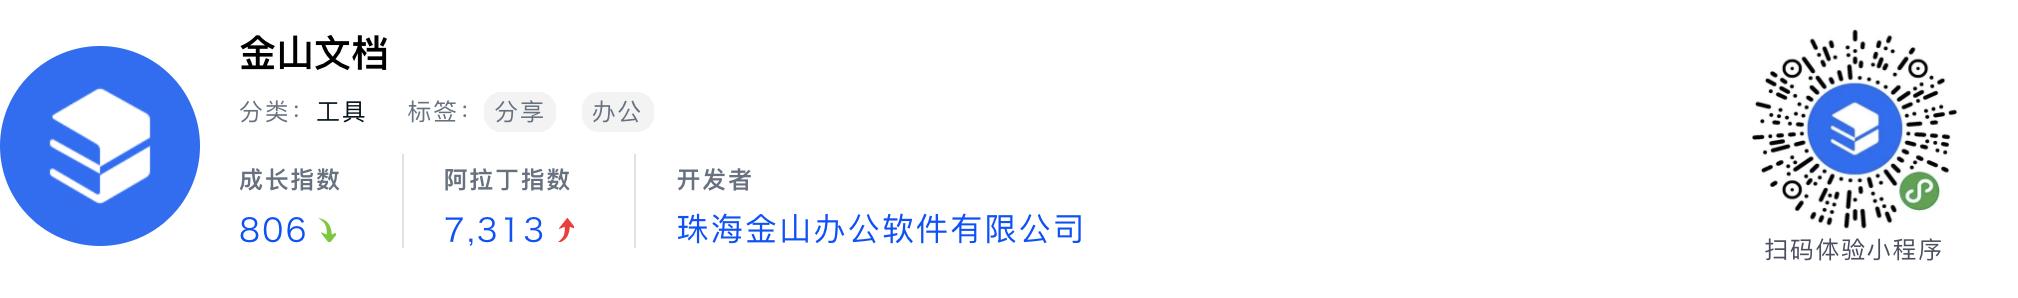 WeChatミニプログラム最新ランキングTOP20【2019年6月版】17位 :金山文档